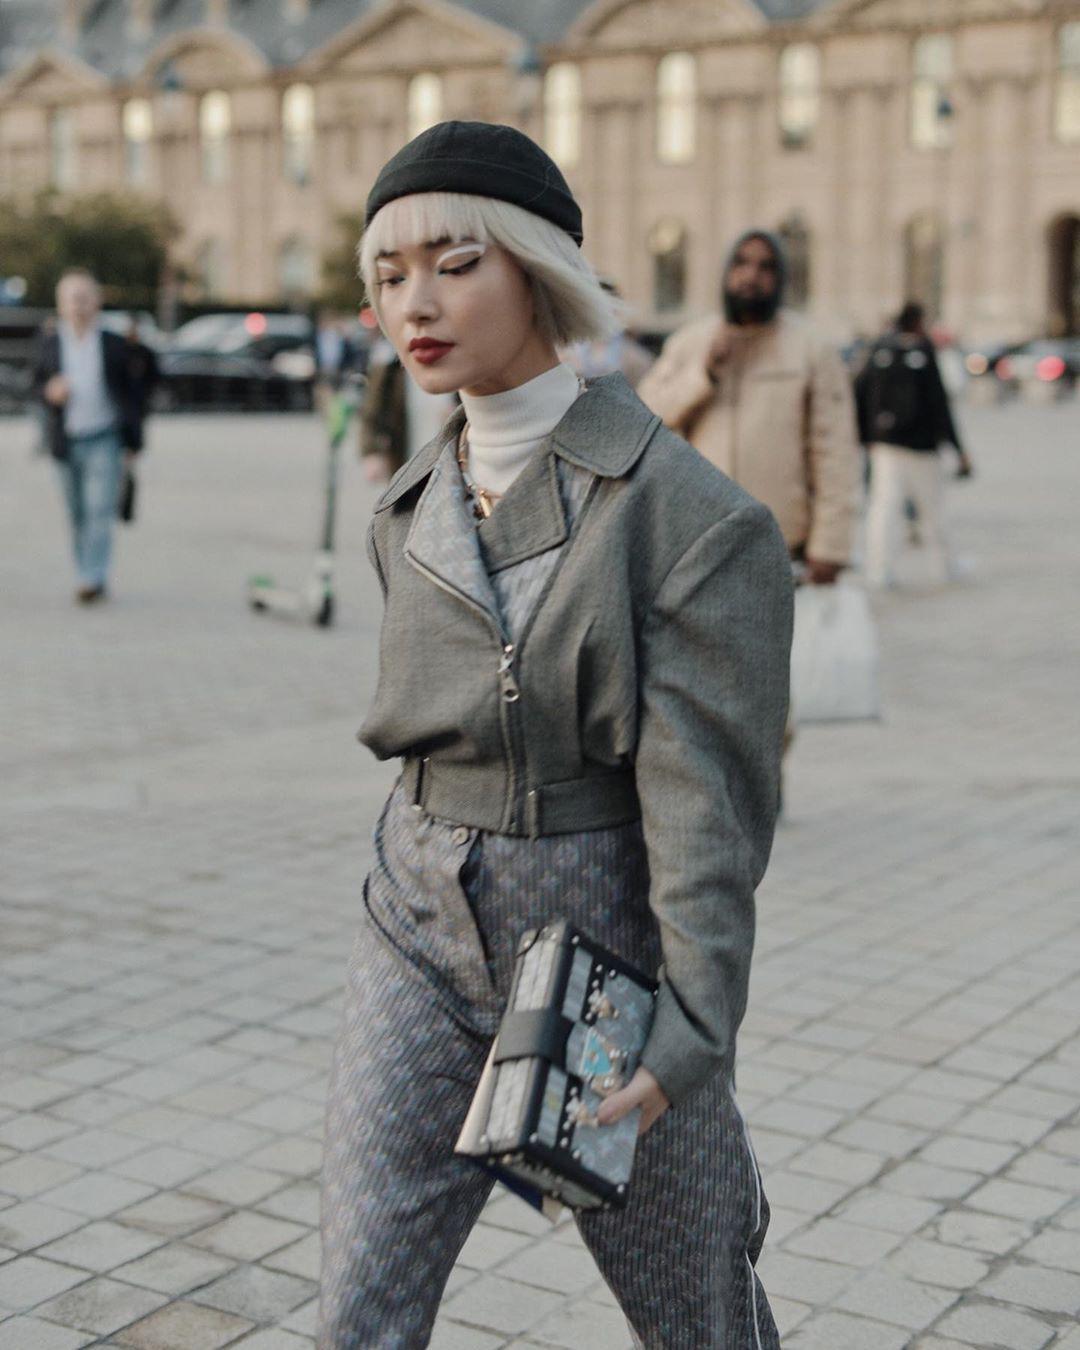 Châu Bùi dự show Louis Vuitton